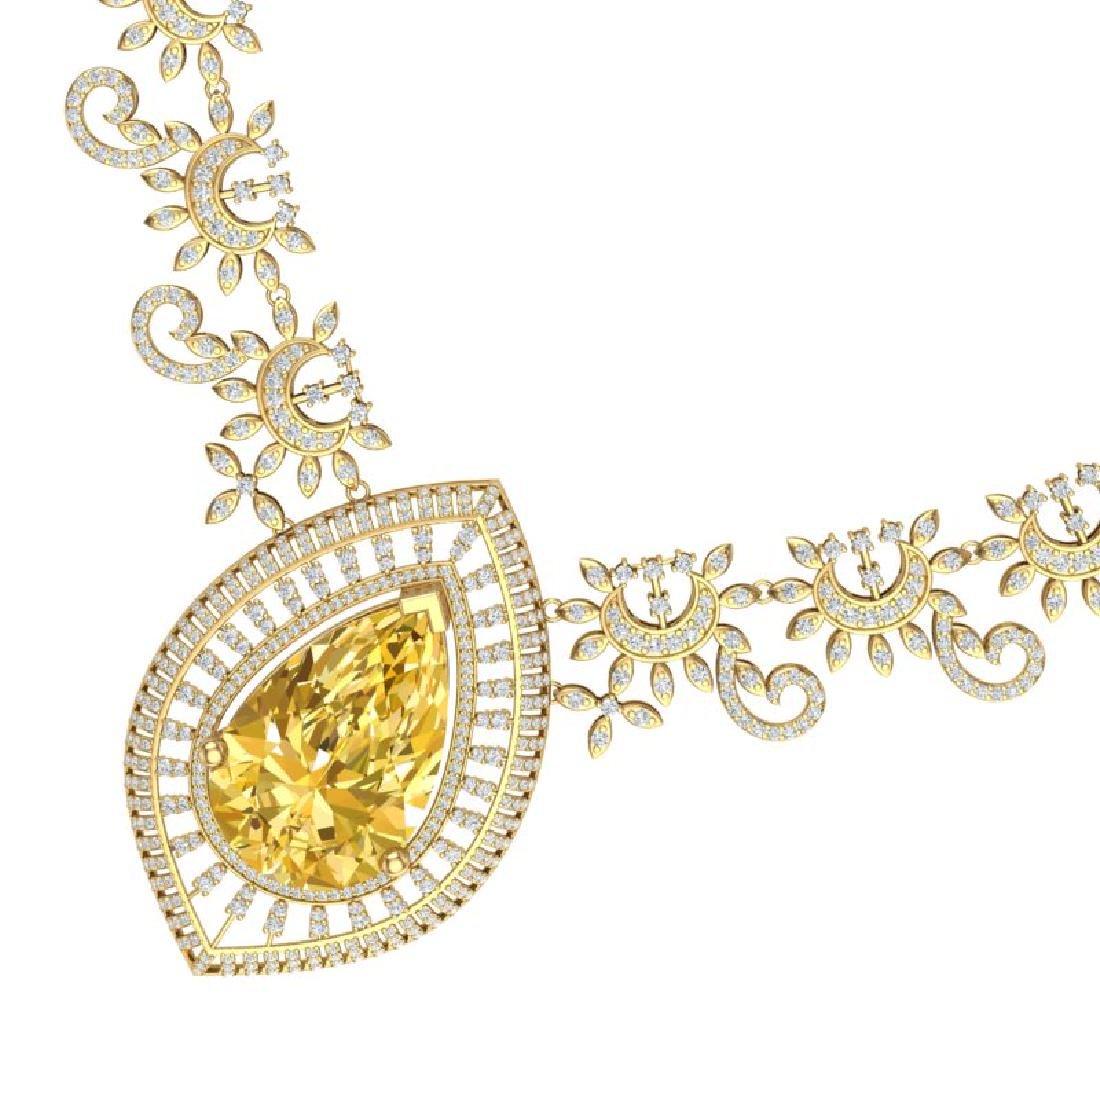 53.17 CTW Royalty Canary Citrine & VS Diamond Necklace